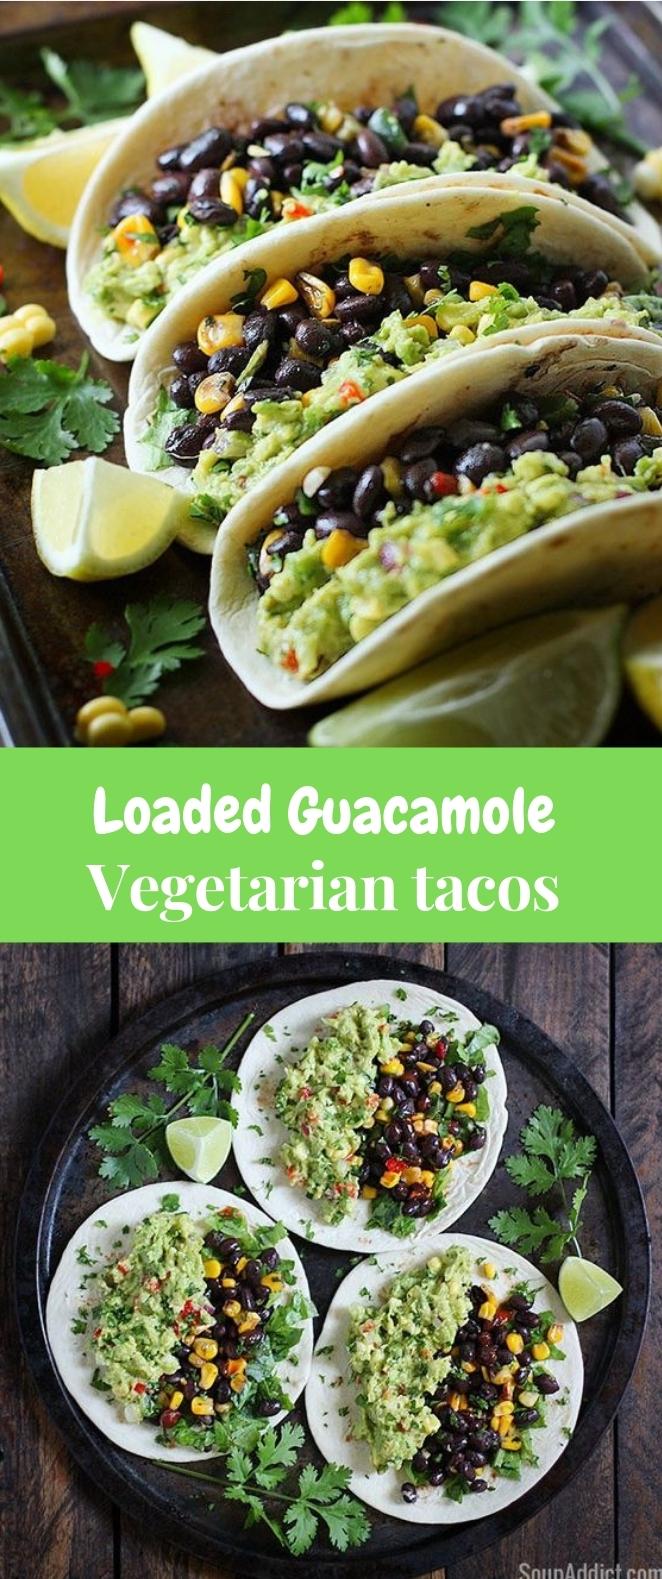 LOADED GUACAMOLE VEGETARIAN TACOS #vegetarian #tacos